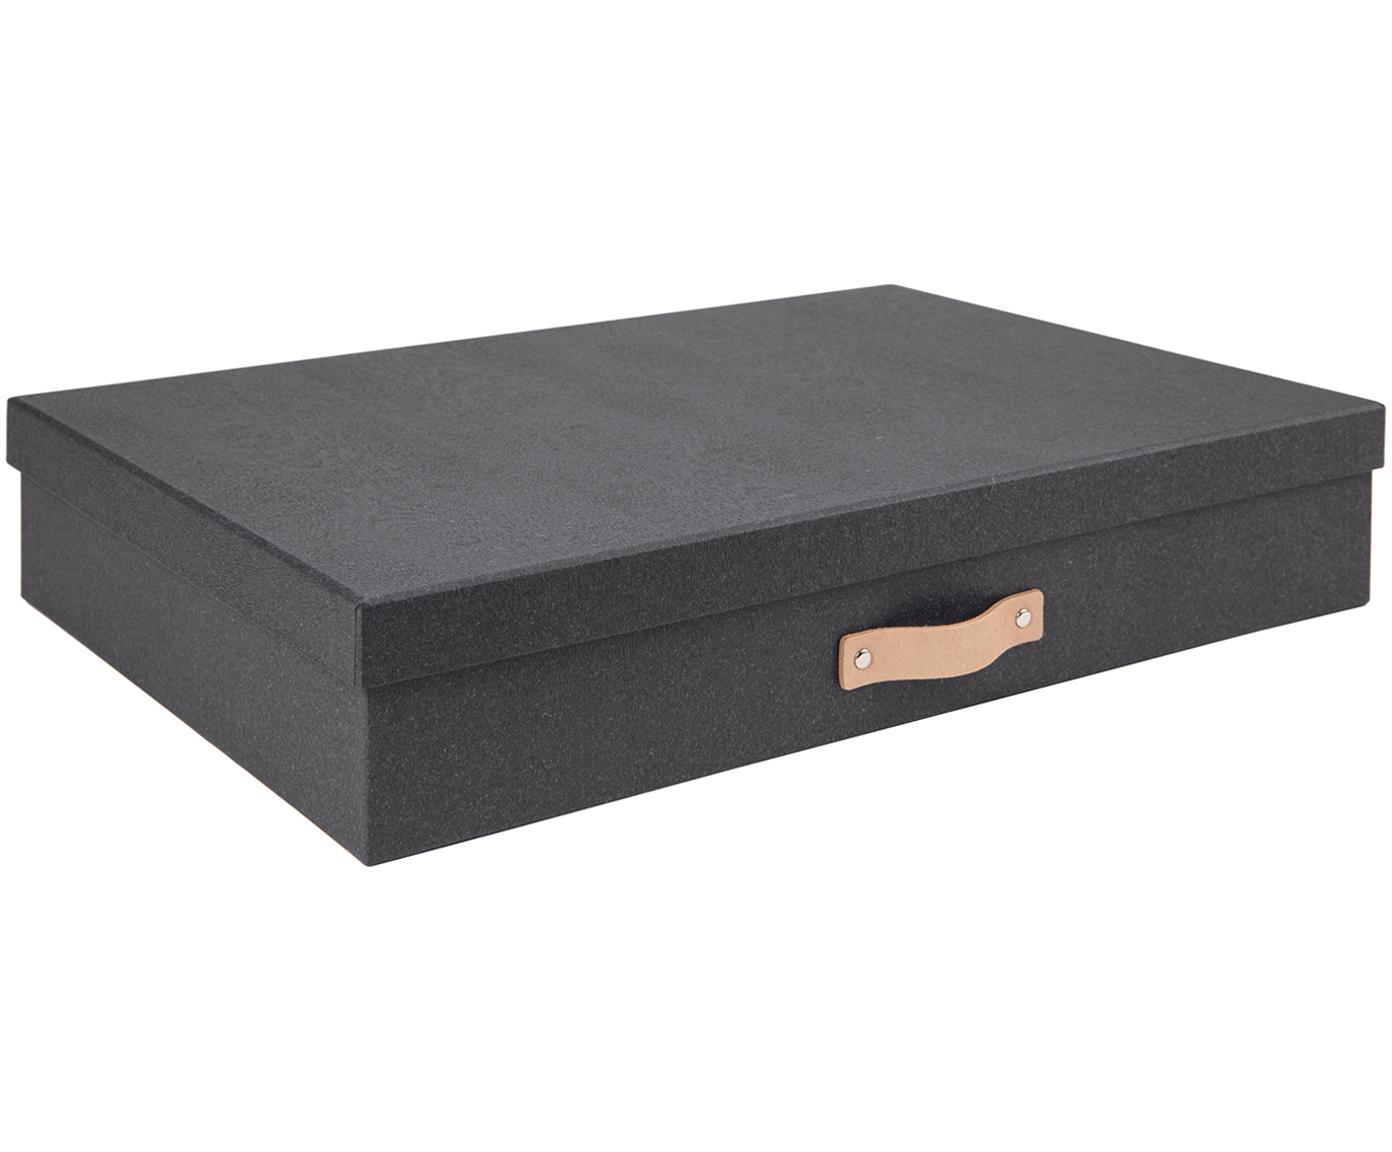 Caja Sverker II, Asa: cuero, Exterior: negro Interior: negro Asa: beige, An 44 x Al 9 cm